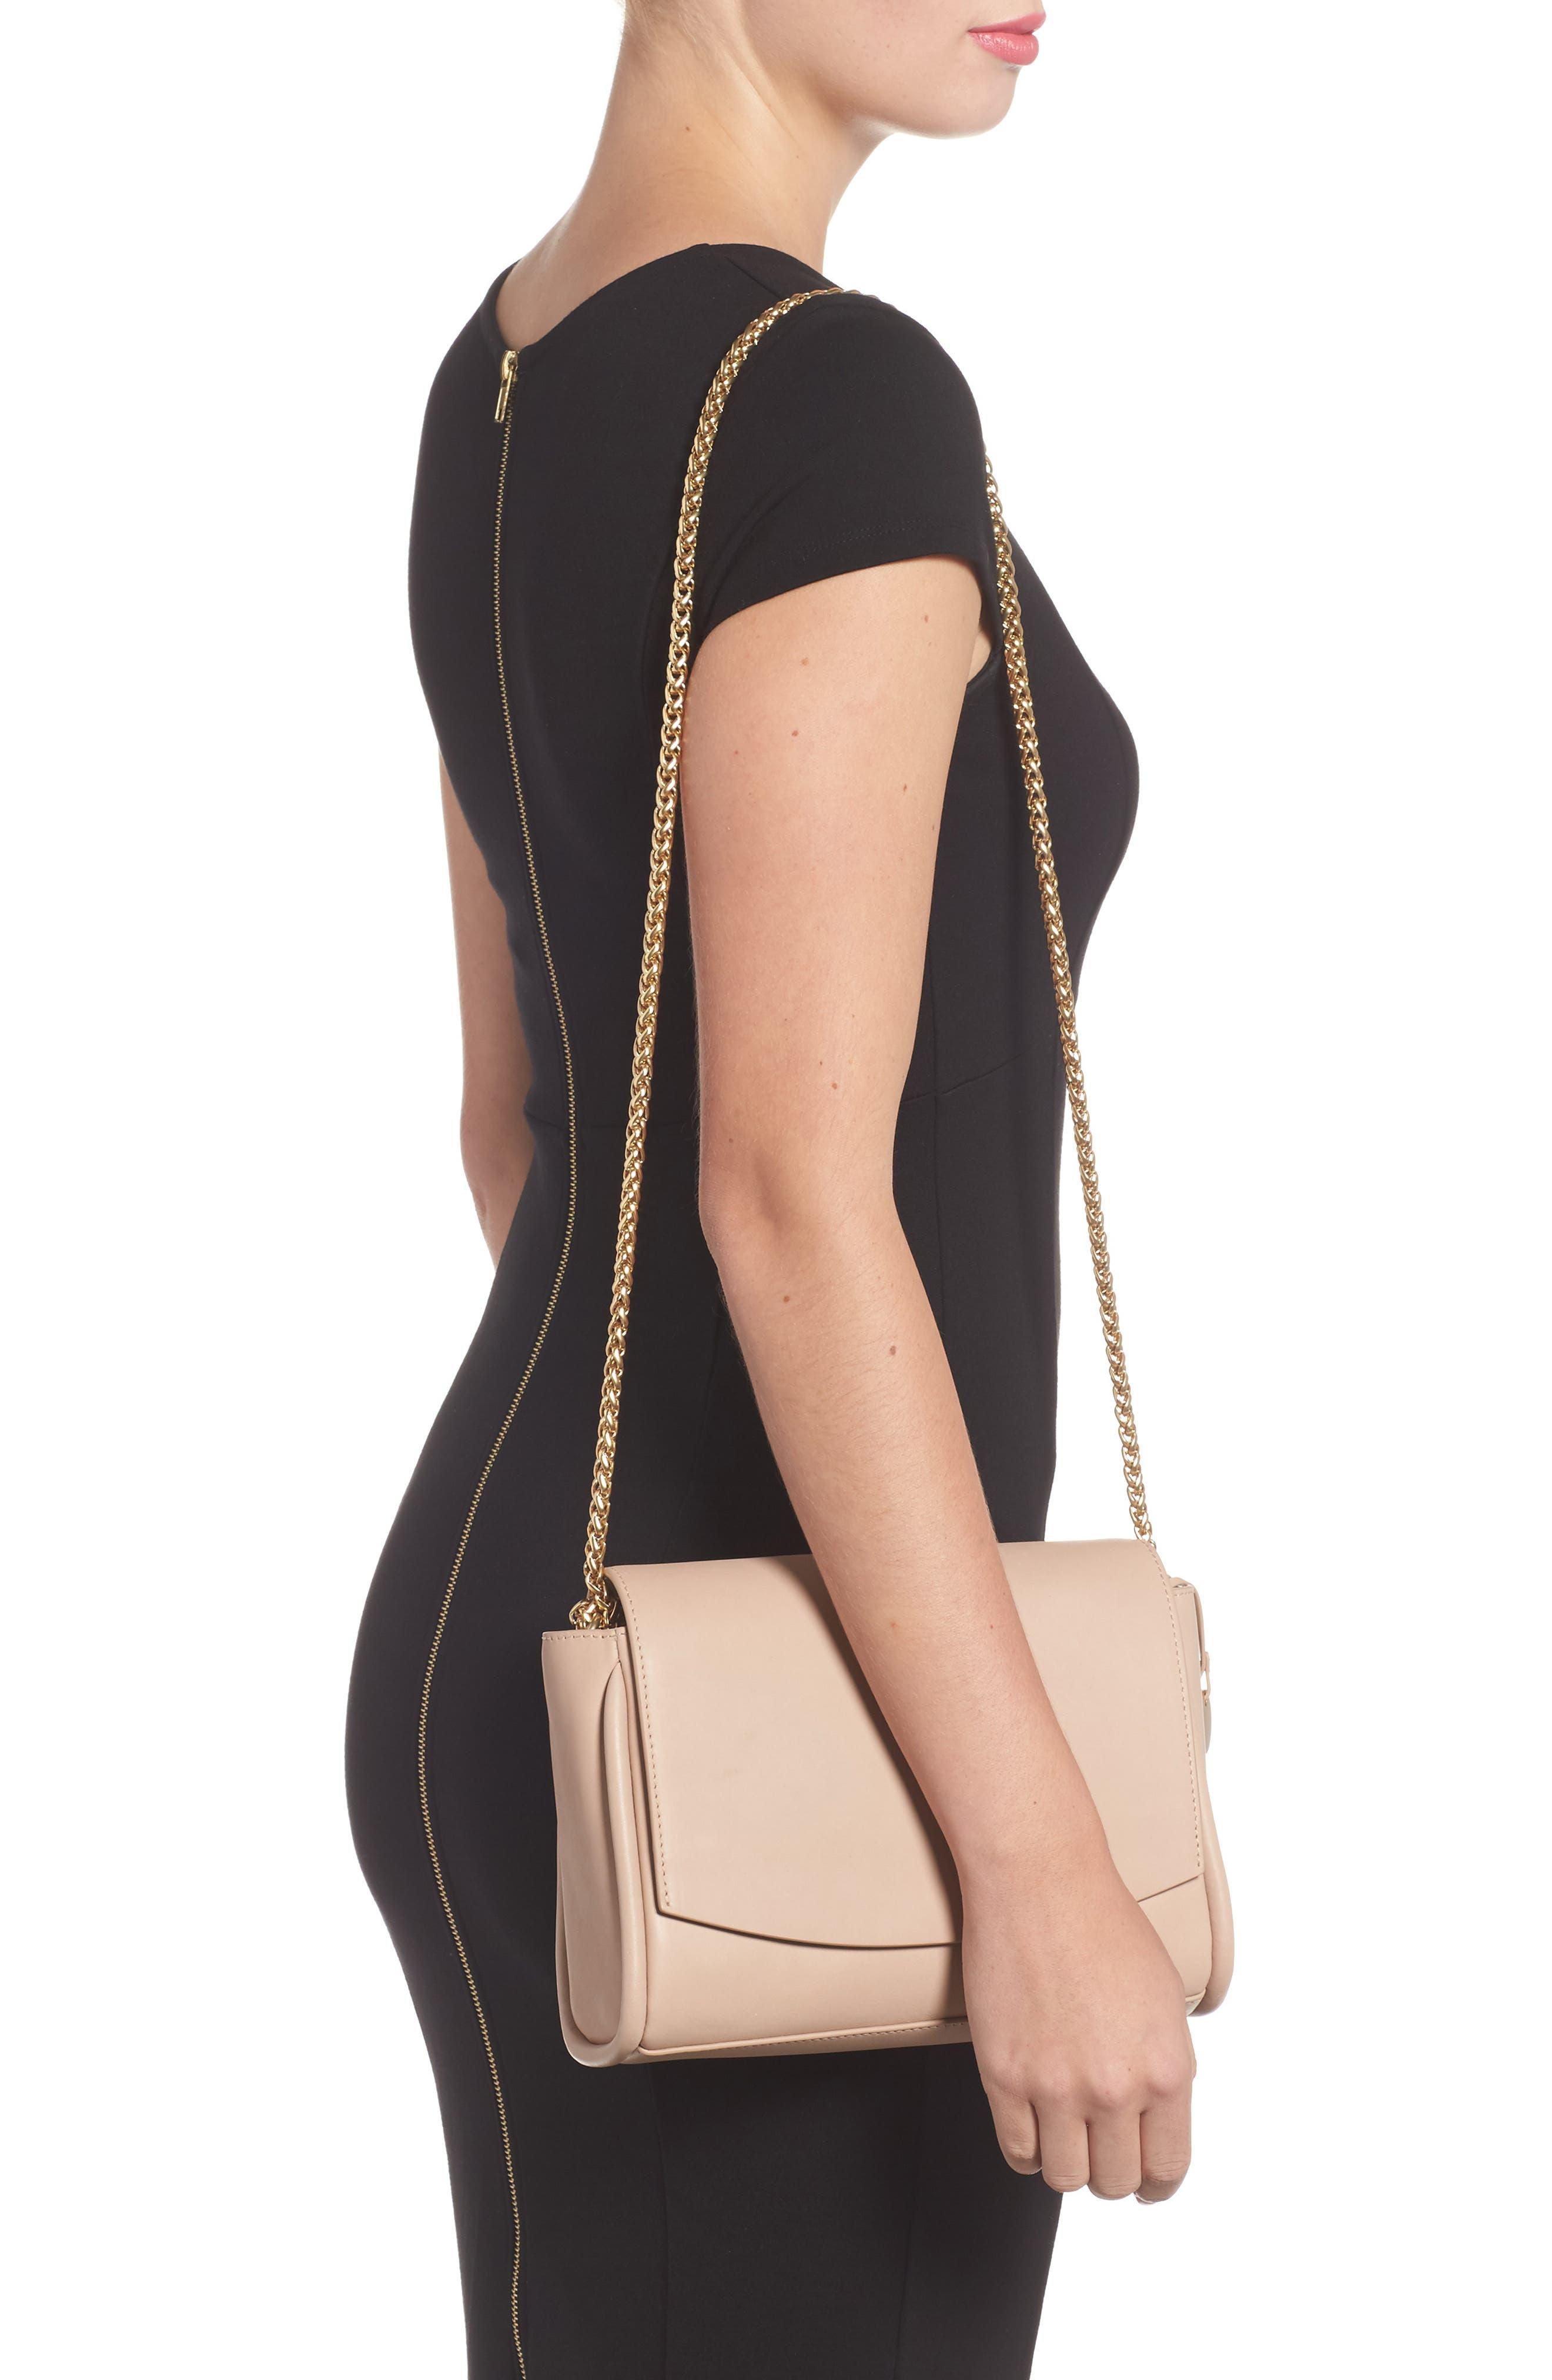 Sylvi Calfskin Leather Crossbody Bag,                             Alternate thumbnail 2, color,                             251